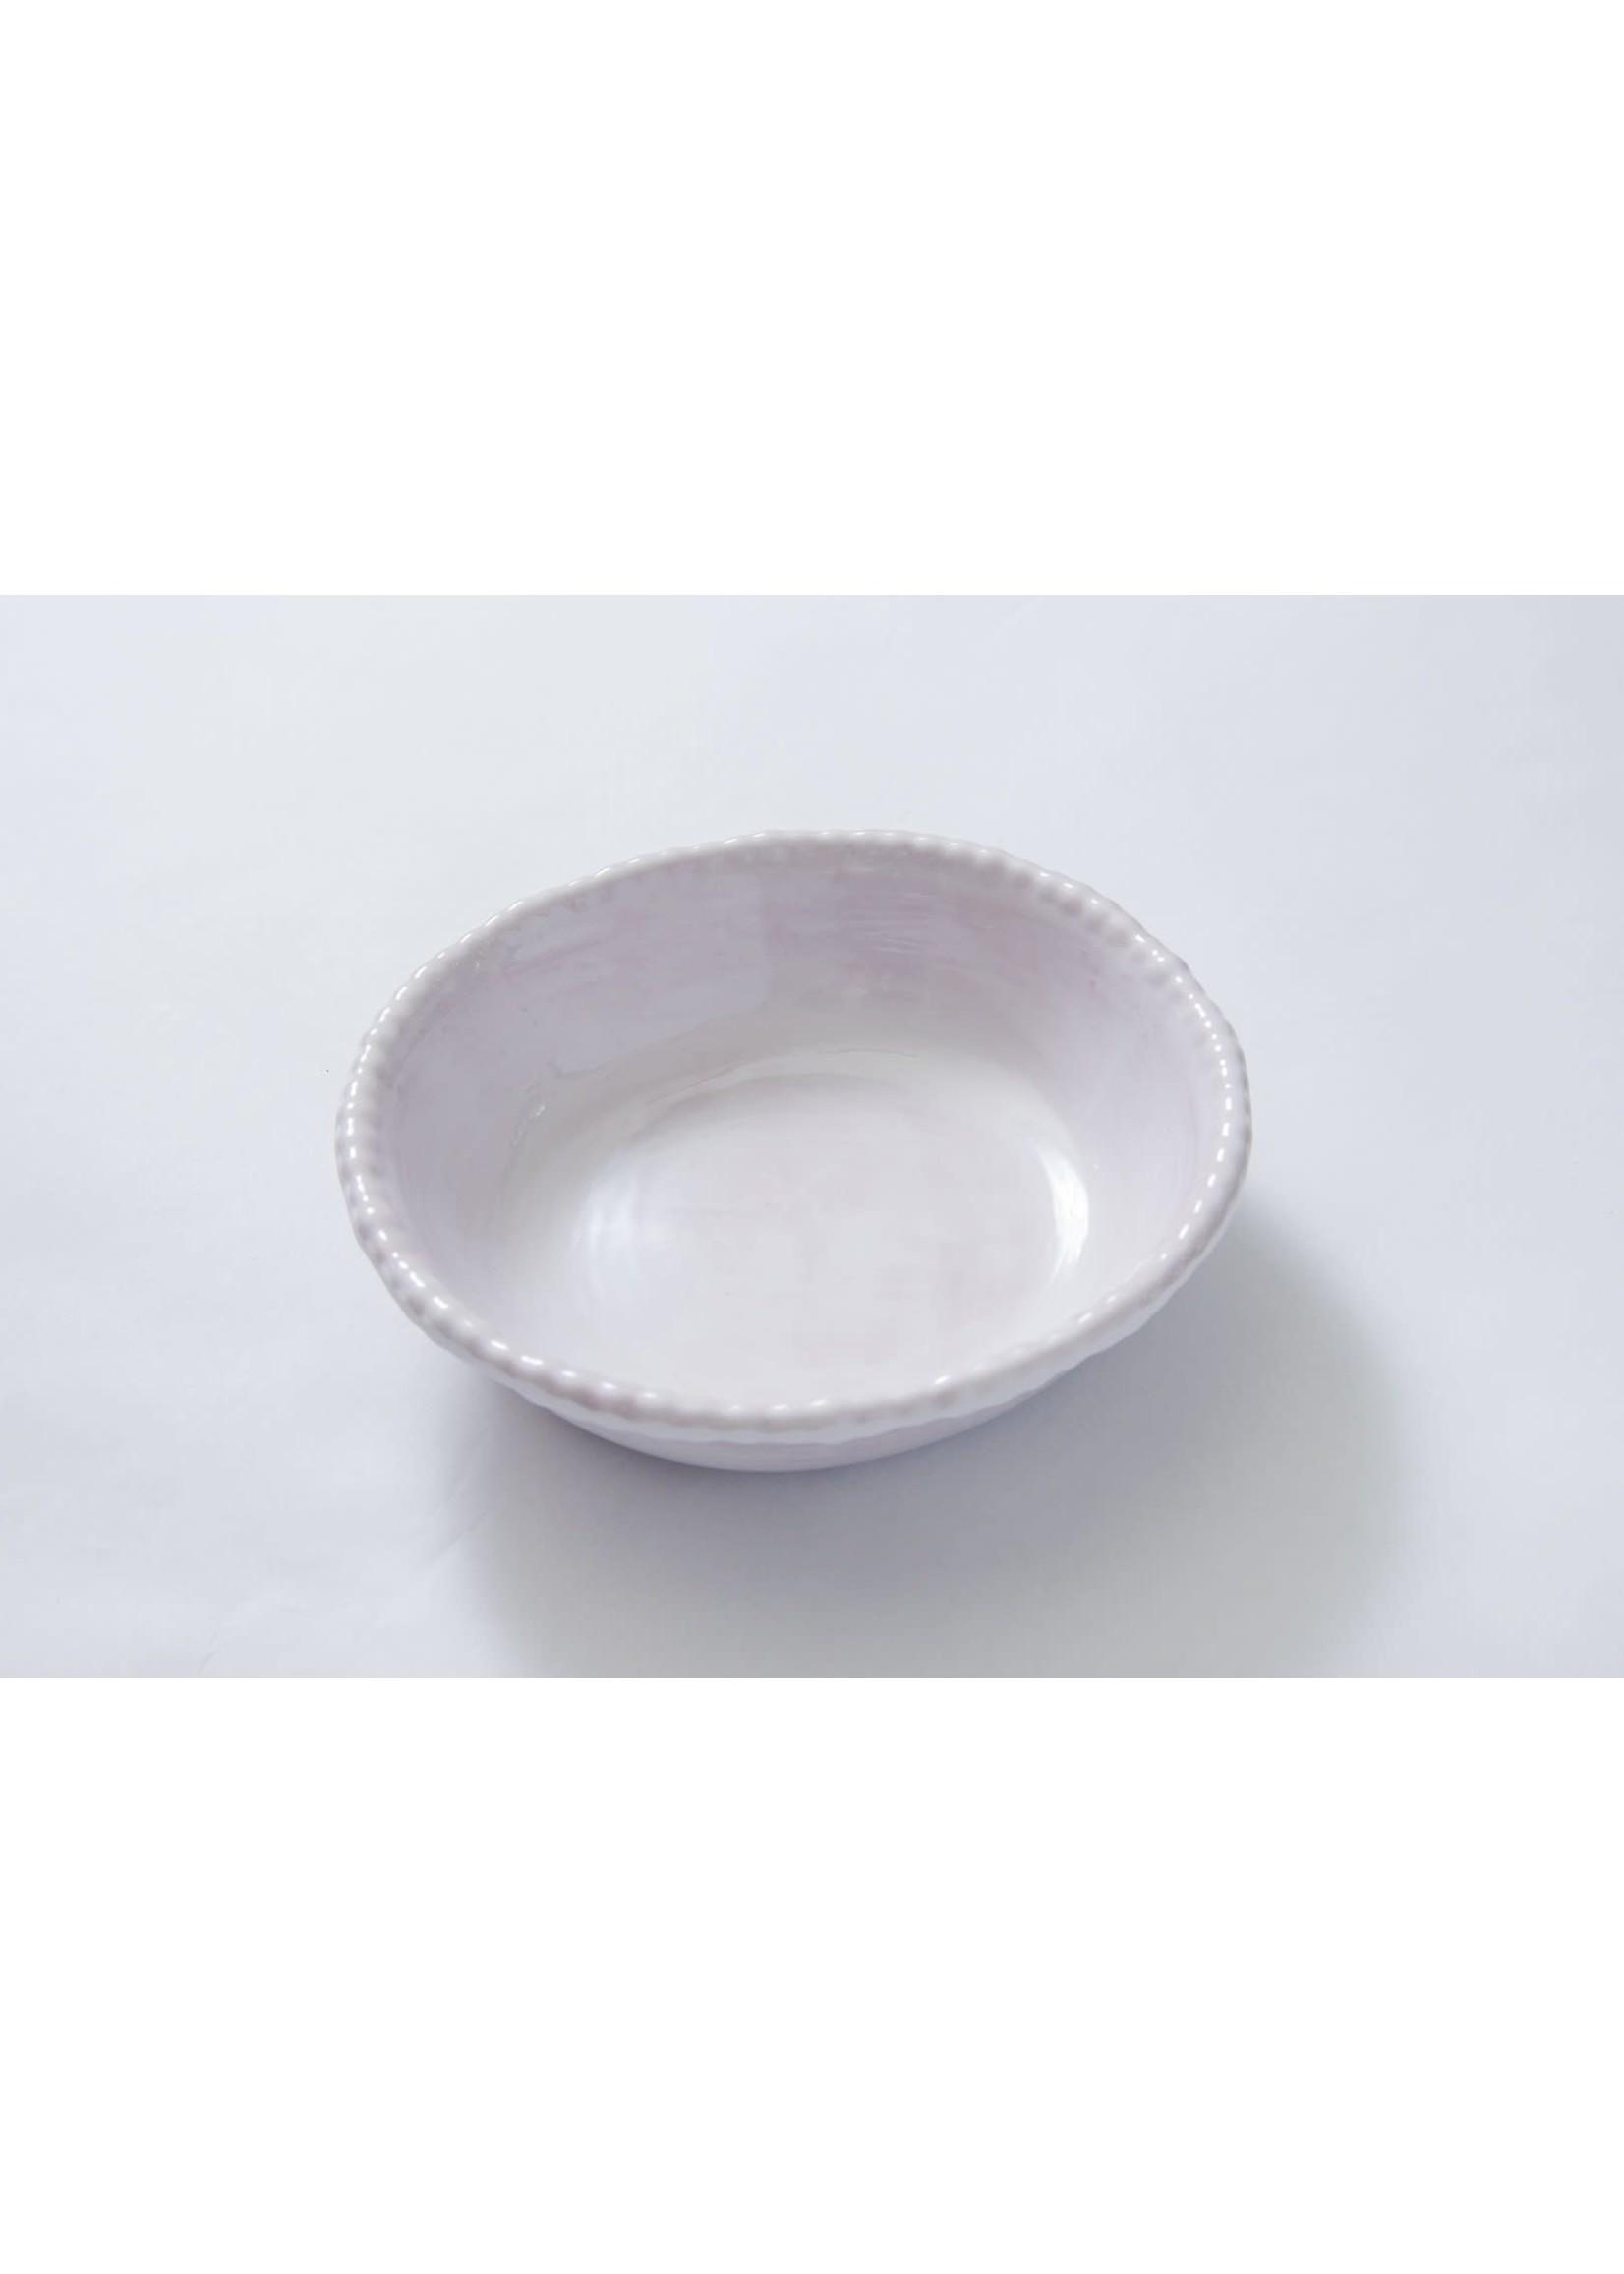 Relish Melamine - Beaded Soup/Cereal Bowl - White